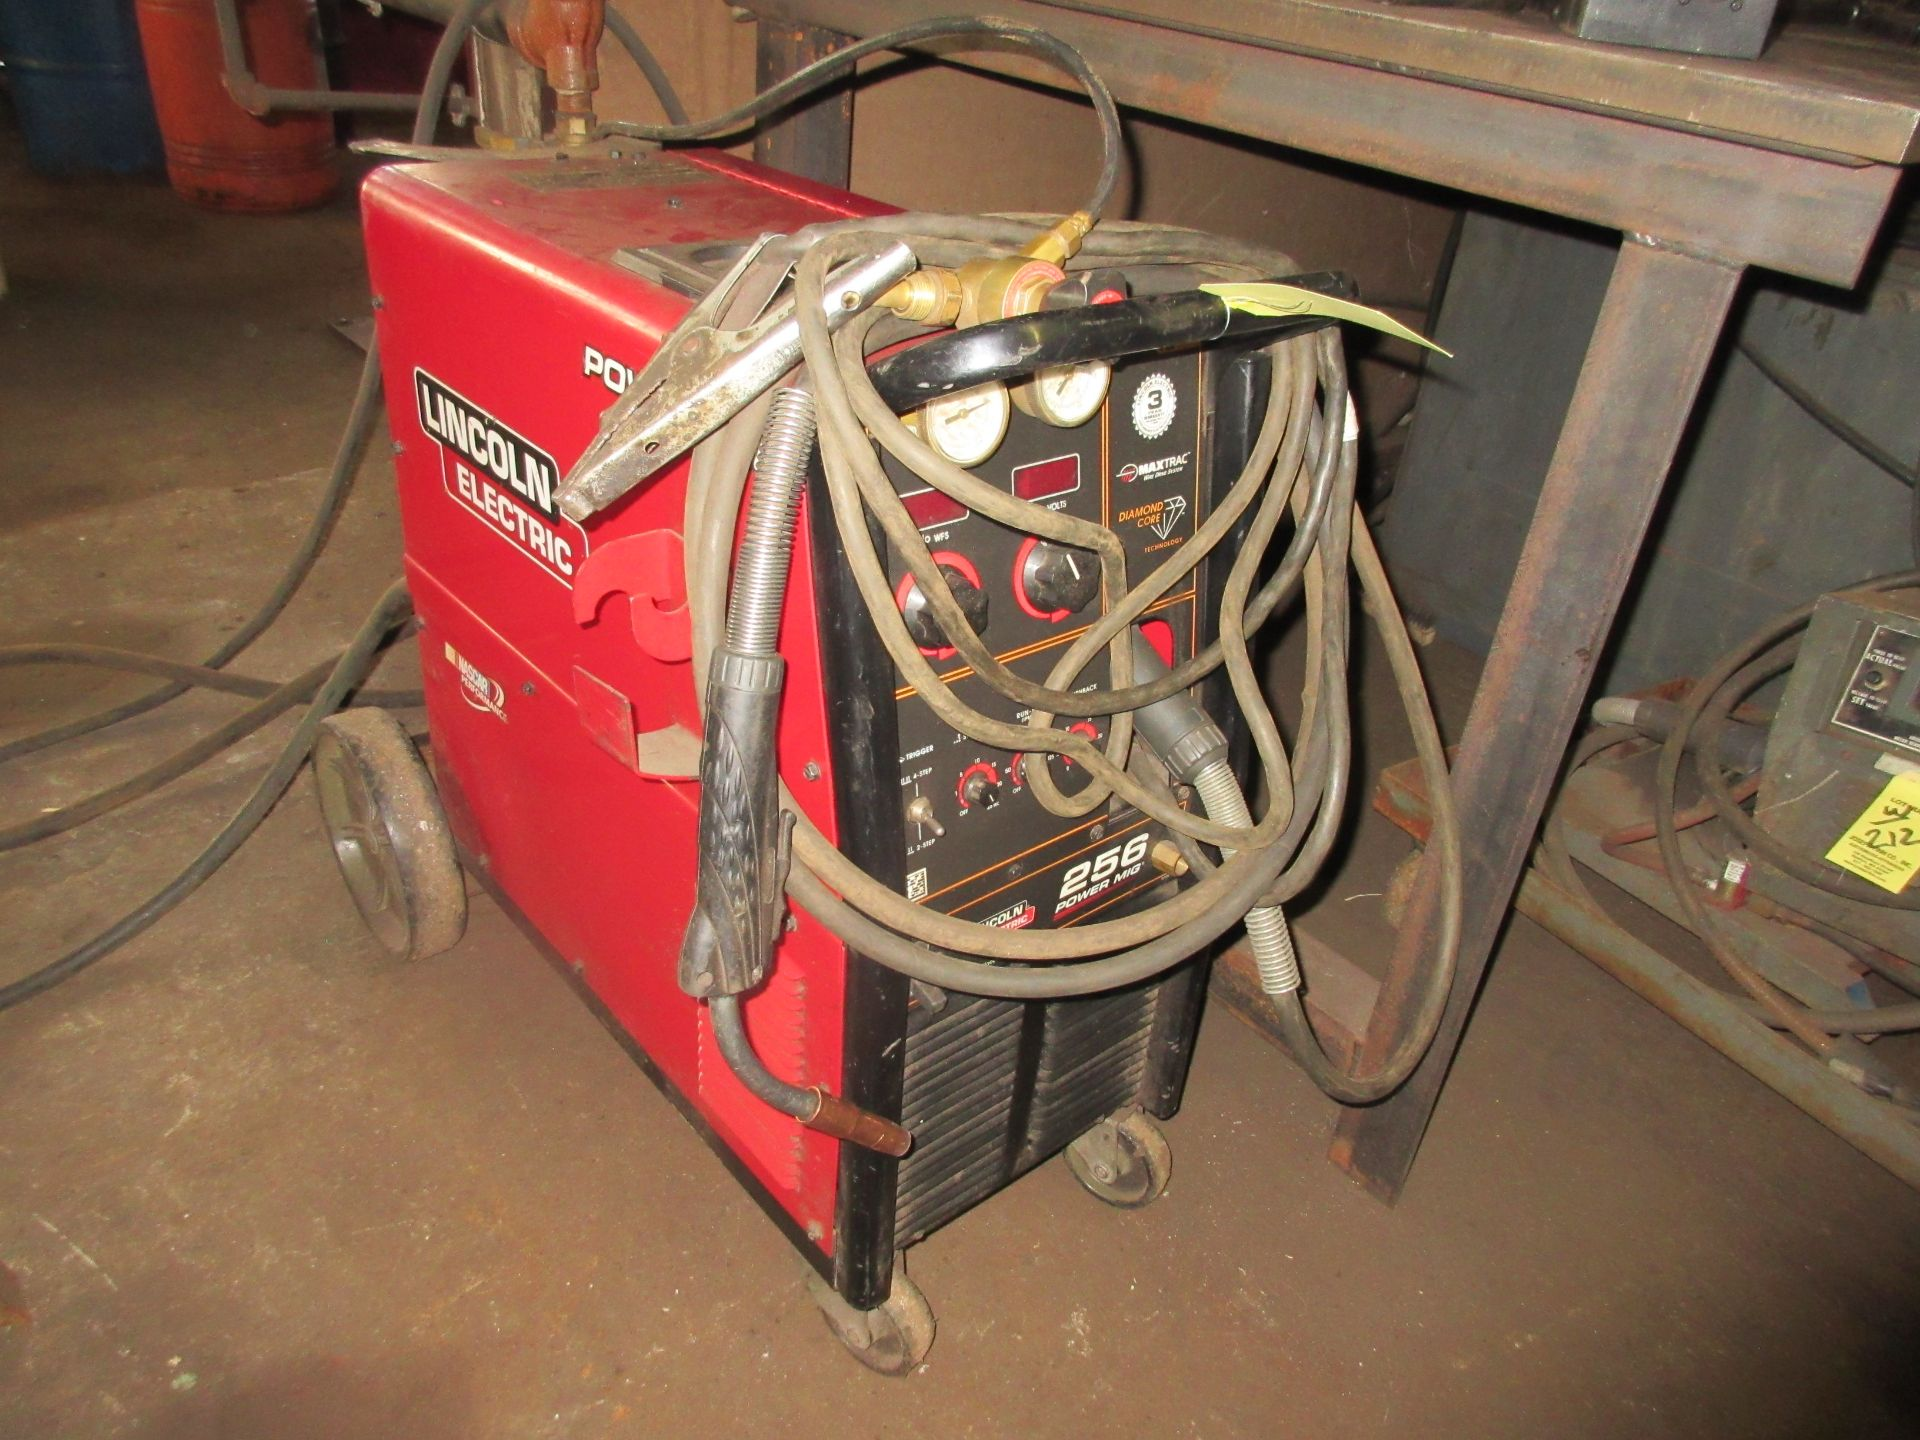 (1) Lincoln Power Mid 256 Welder, S/N M3130607185